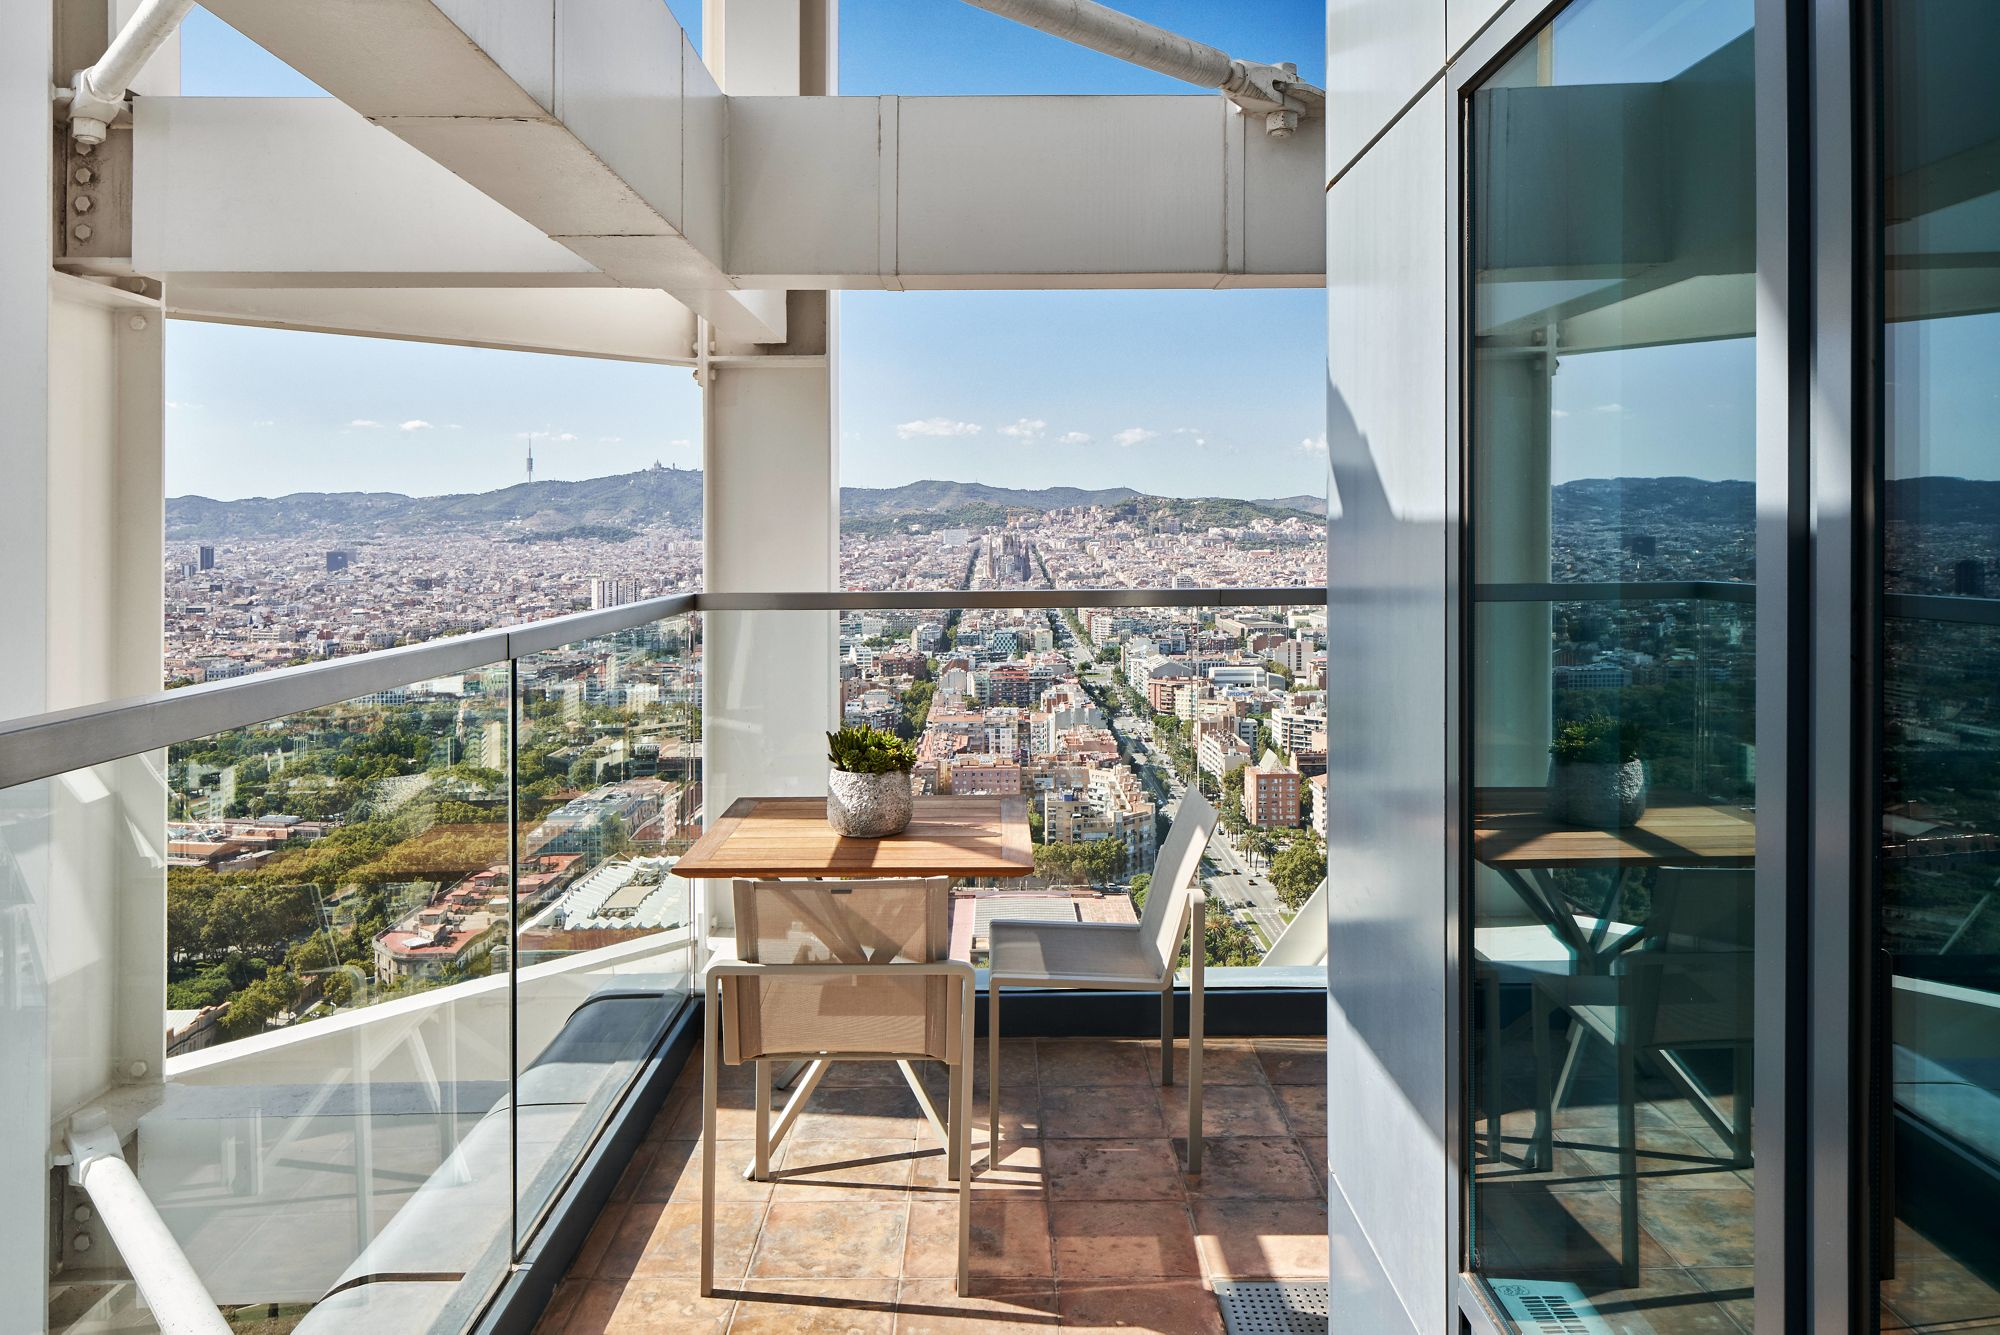 The Barcelona Penthouse Terrace